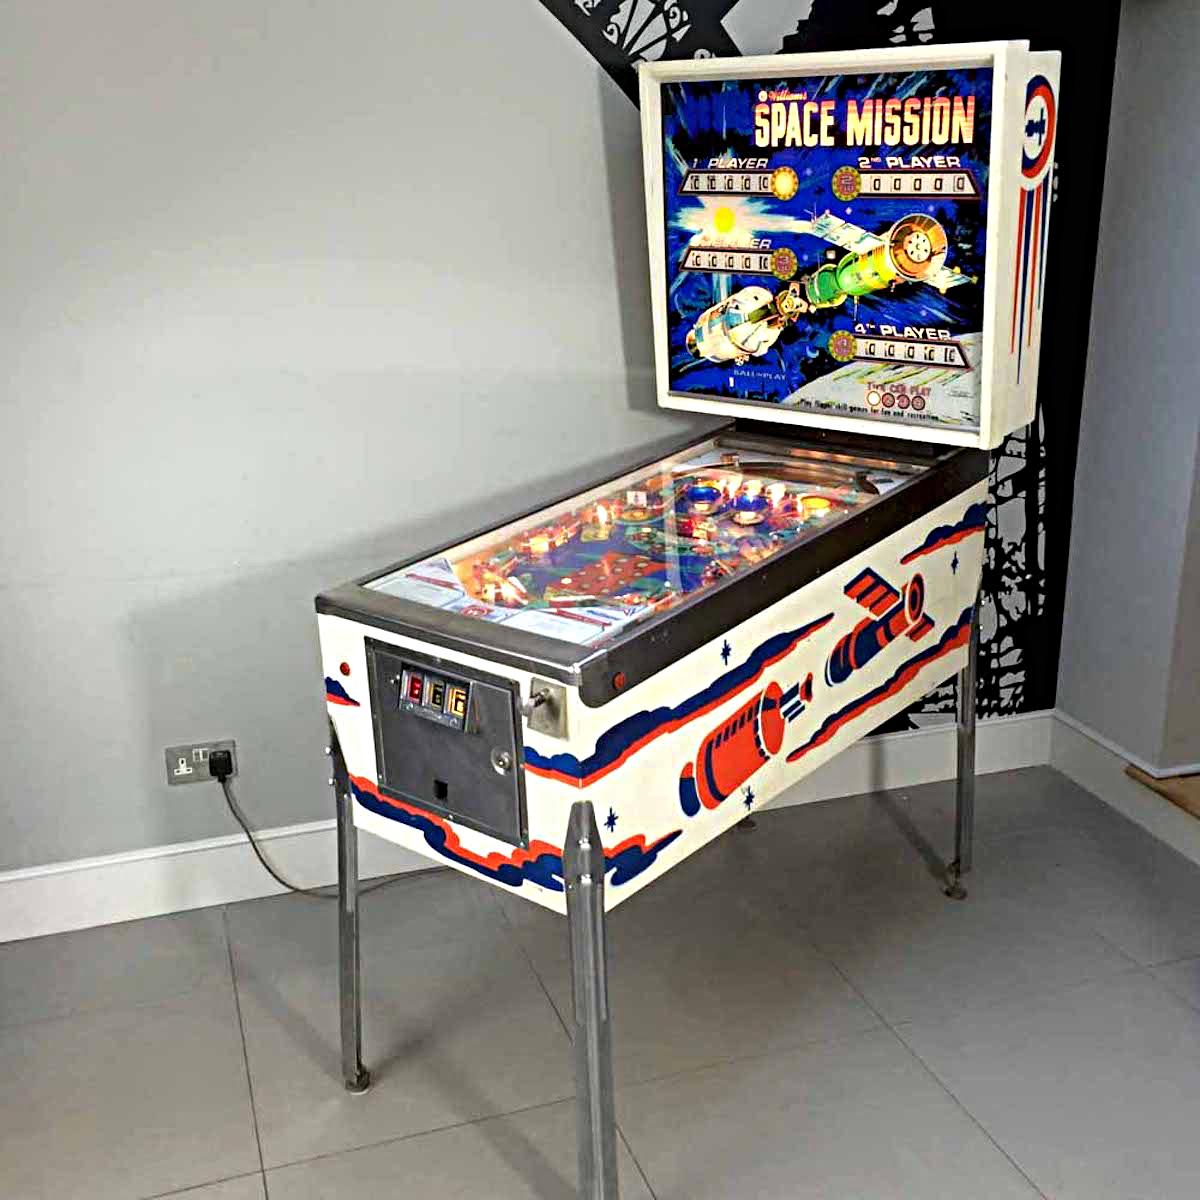 Arcade Game Room: Space Mission Pinball Machine